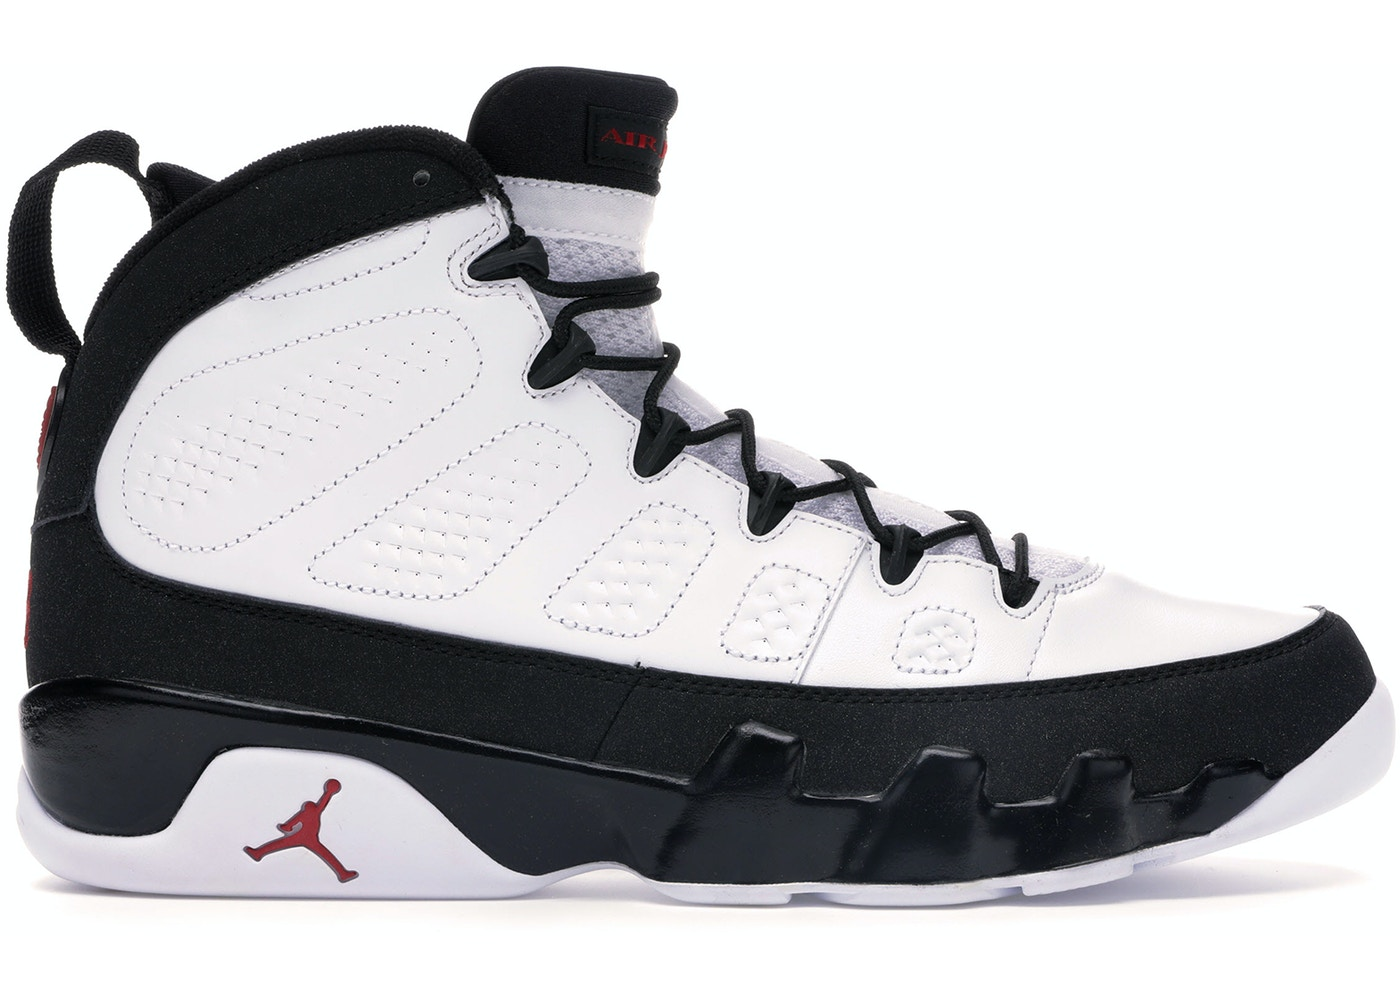 Jordan 9 Retro White Black Red 2010 302370 102